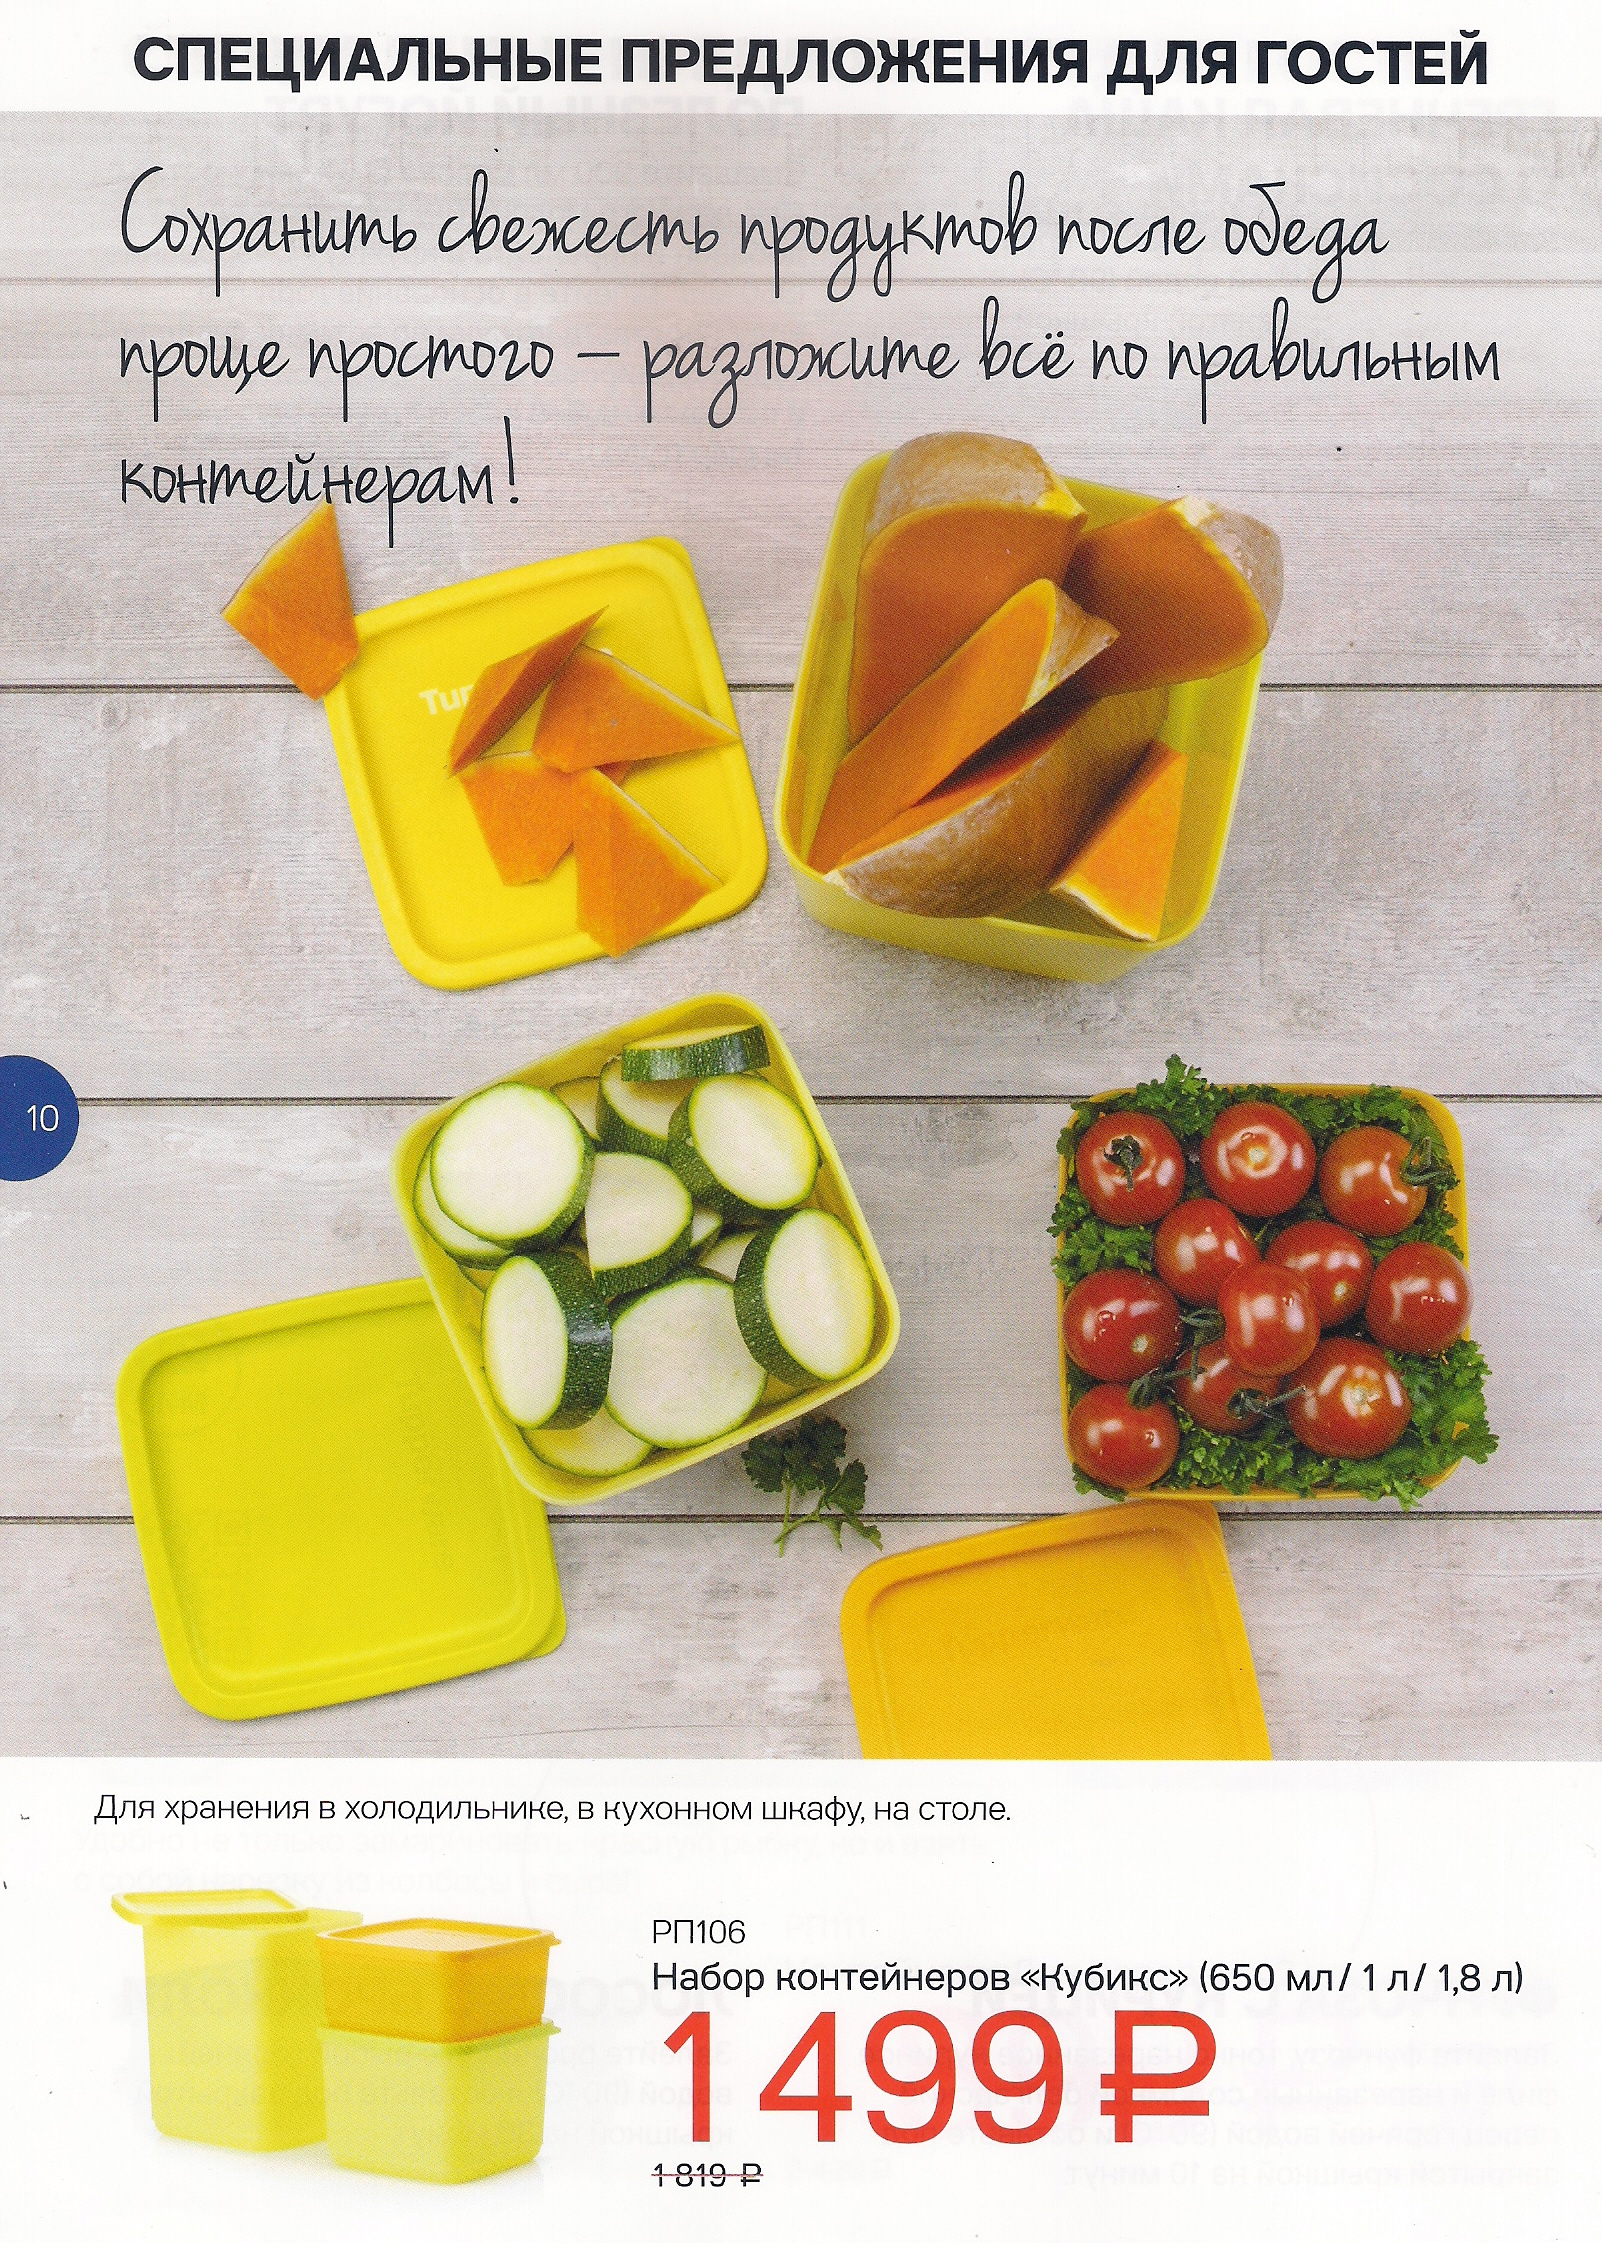 http://tupperware-online.ru/images/upload/9l.jpg